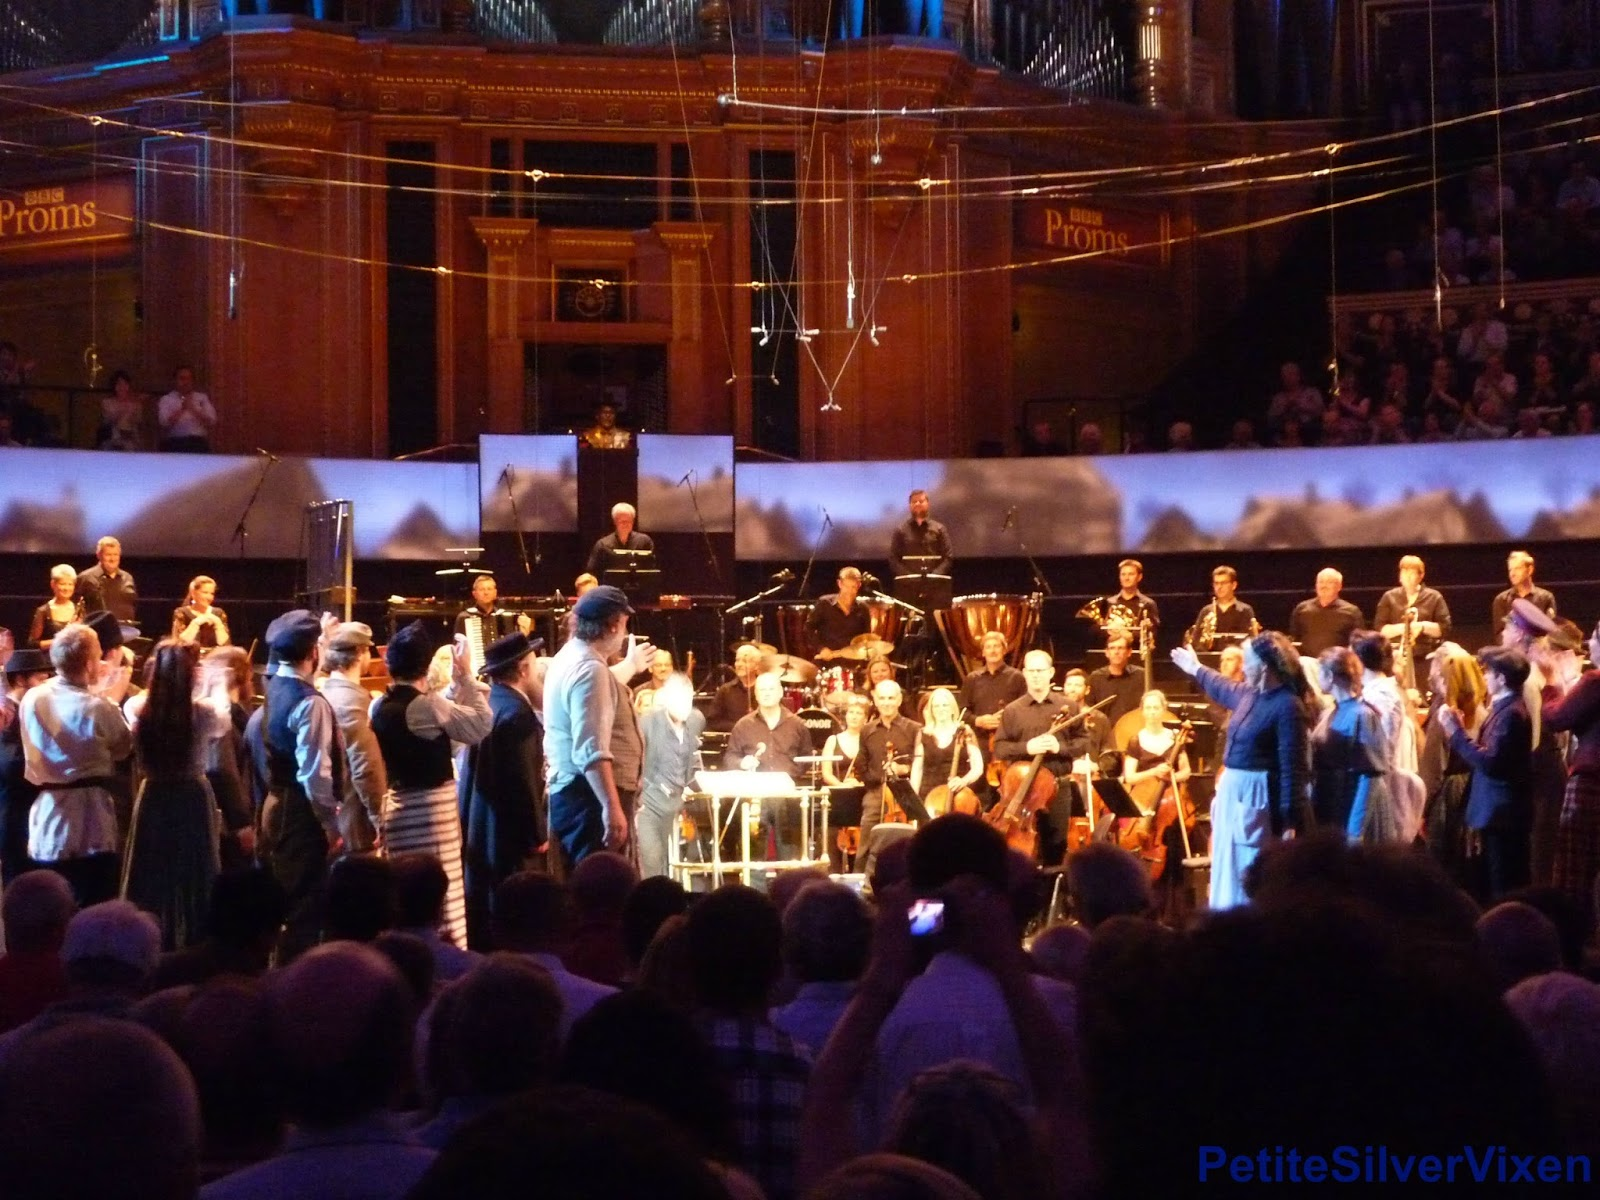 Bryn Terfel & Cast applaud BBC Concert Orchestra | PetiteSilverVixen